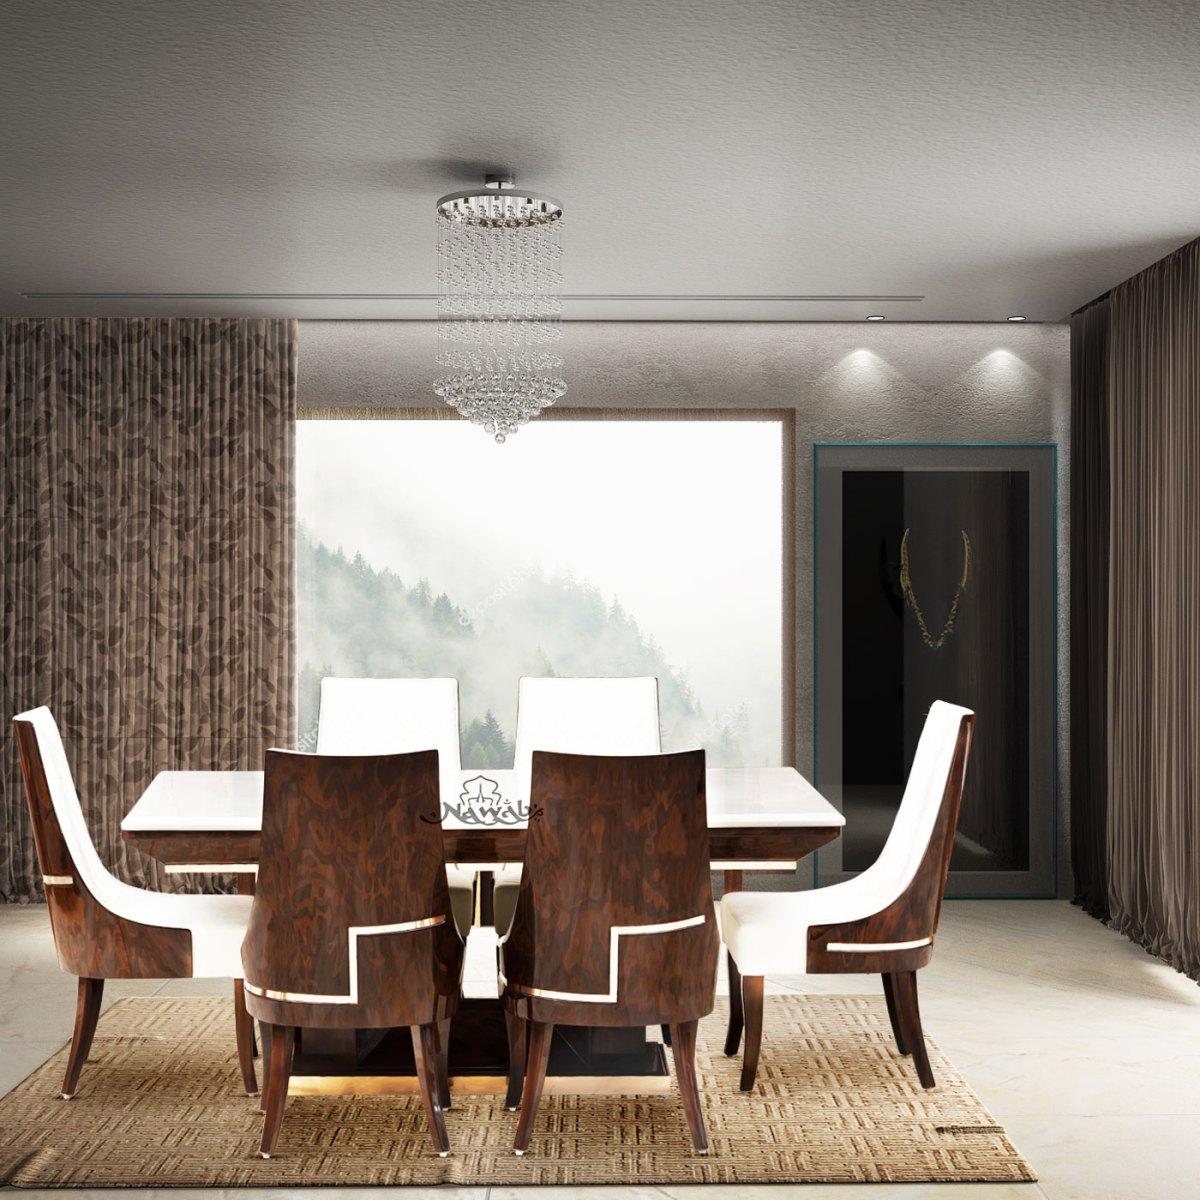 onex-marble-top-bearl-veneer-polyester-polish-Rose-gold-plating-foam-padding-suede-fabric